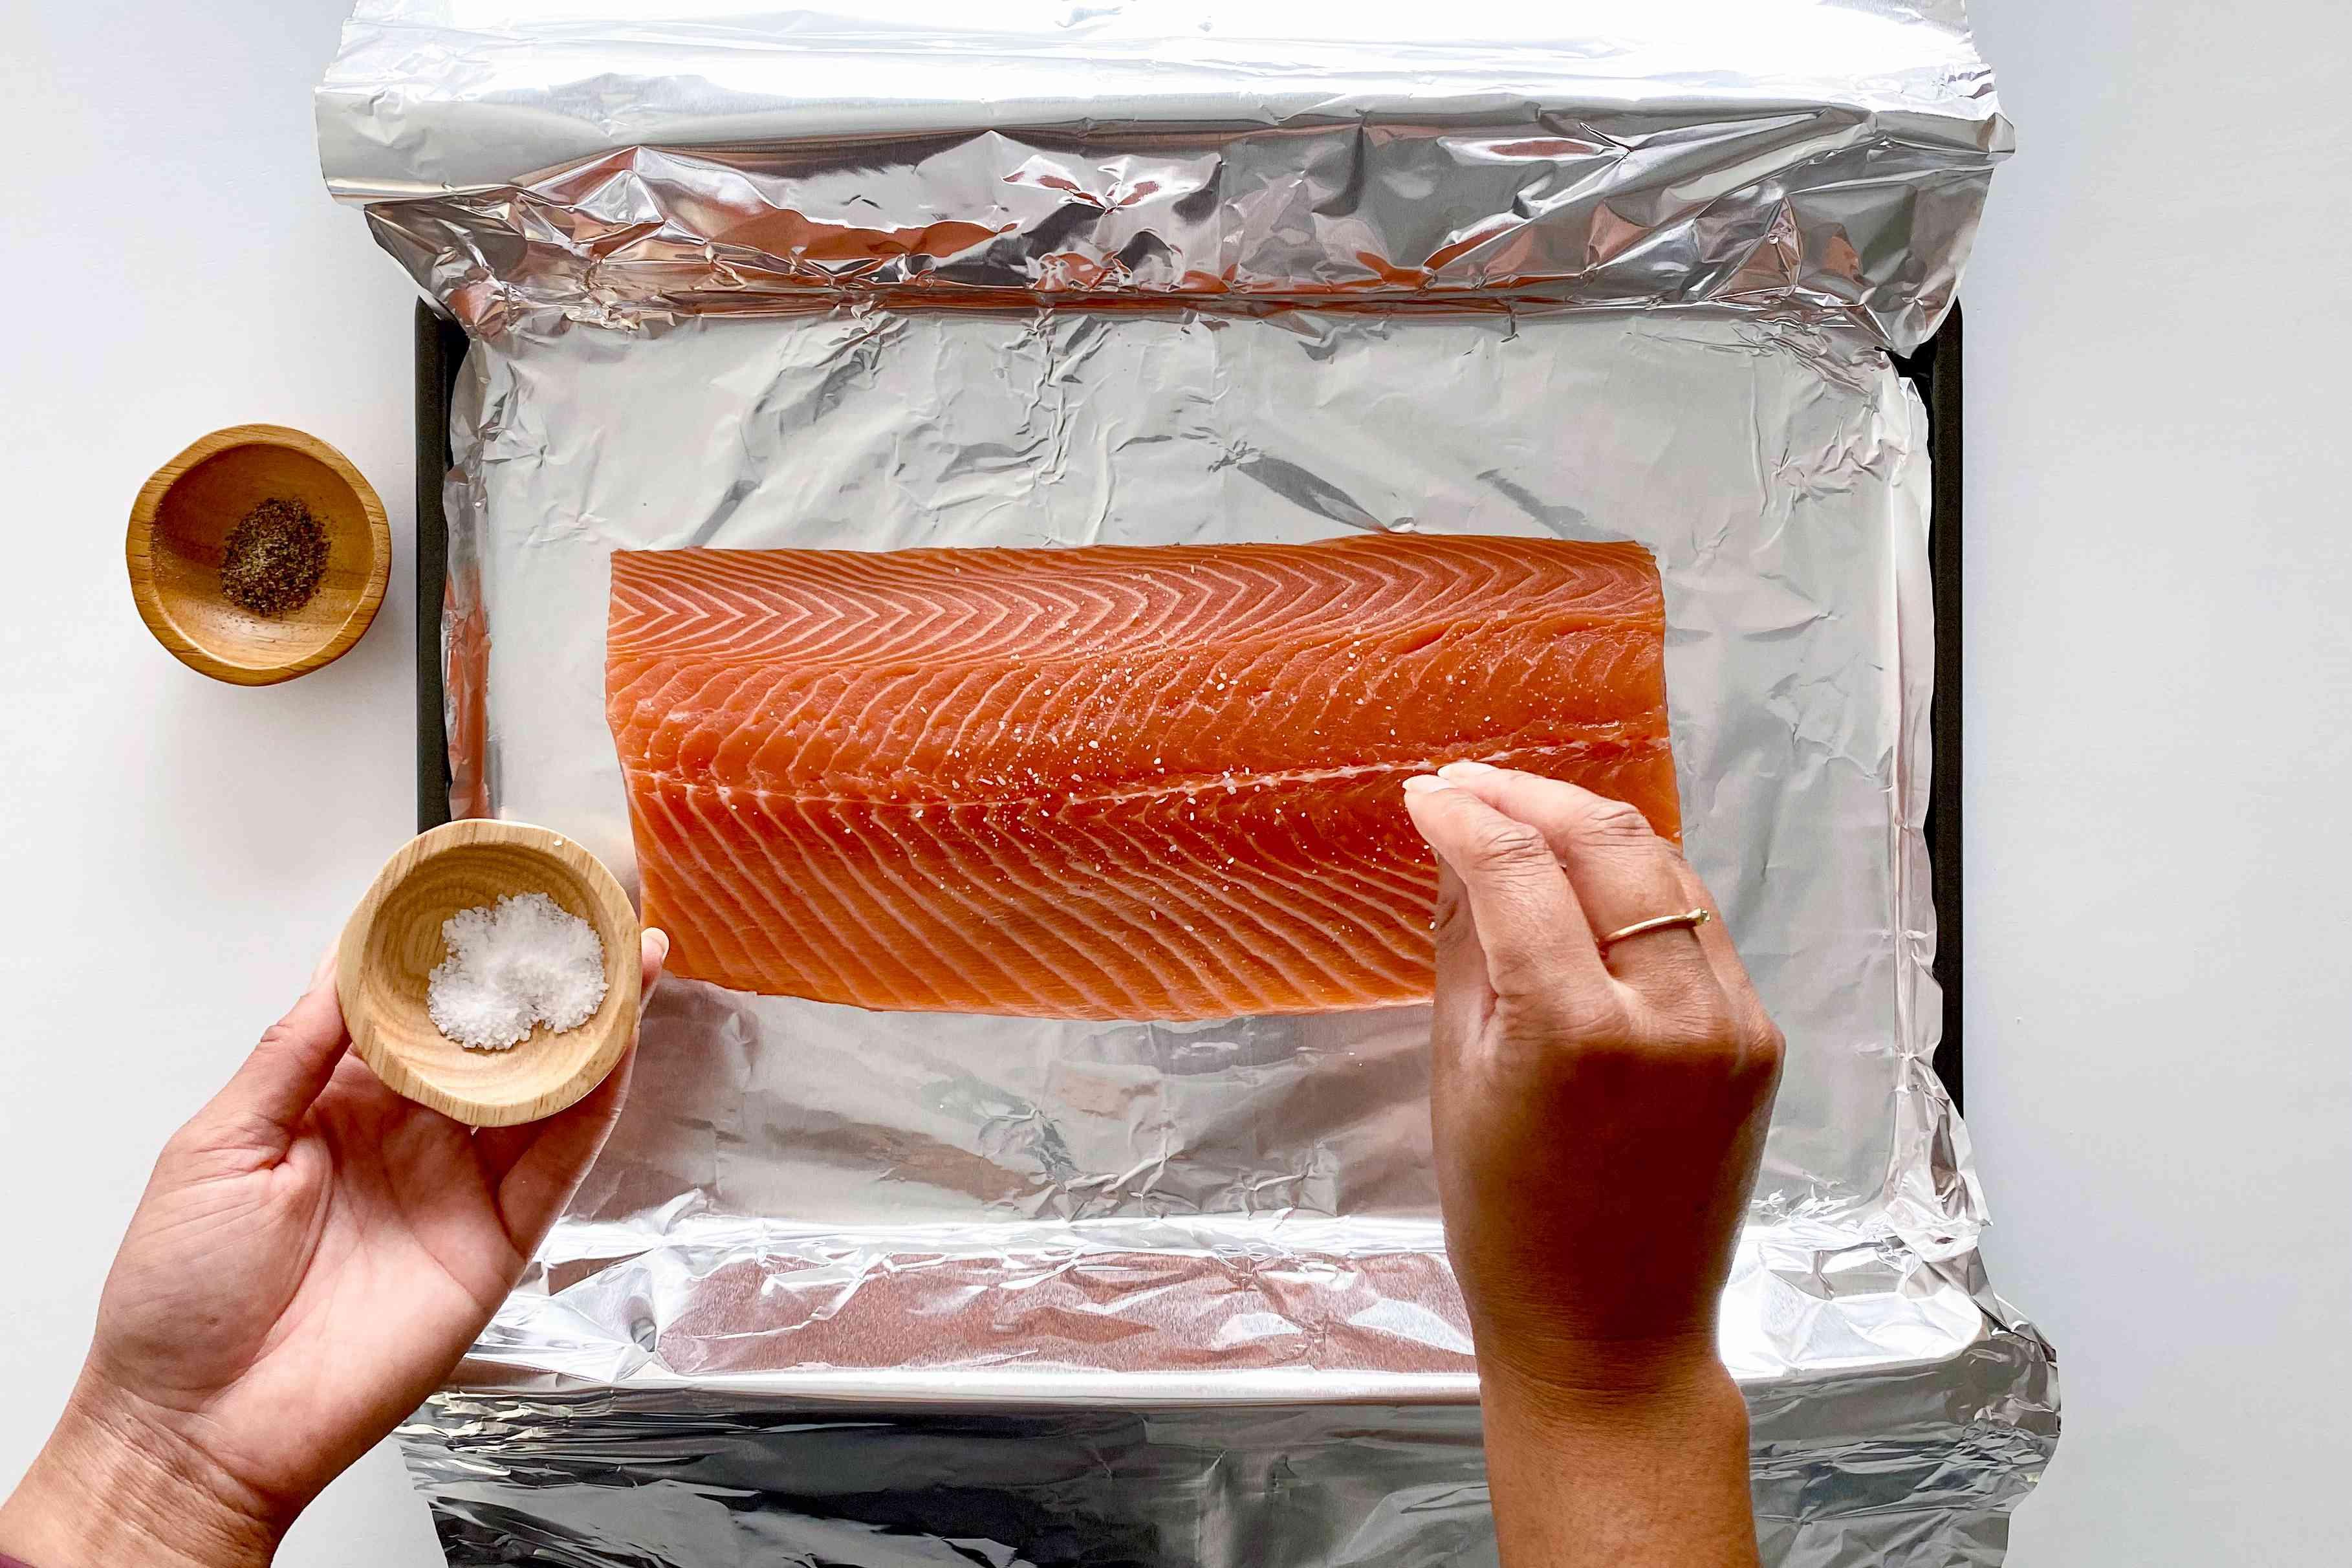 Seasoning salmon on a foil lined baking sheet to make Garlic Butter Baked Salmon.